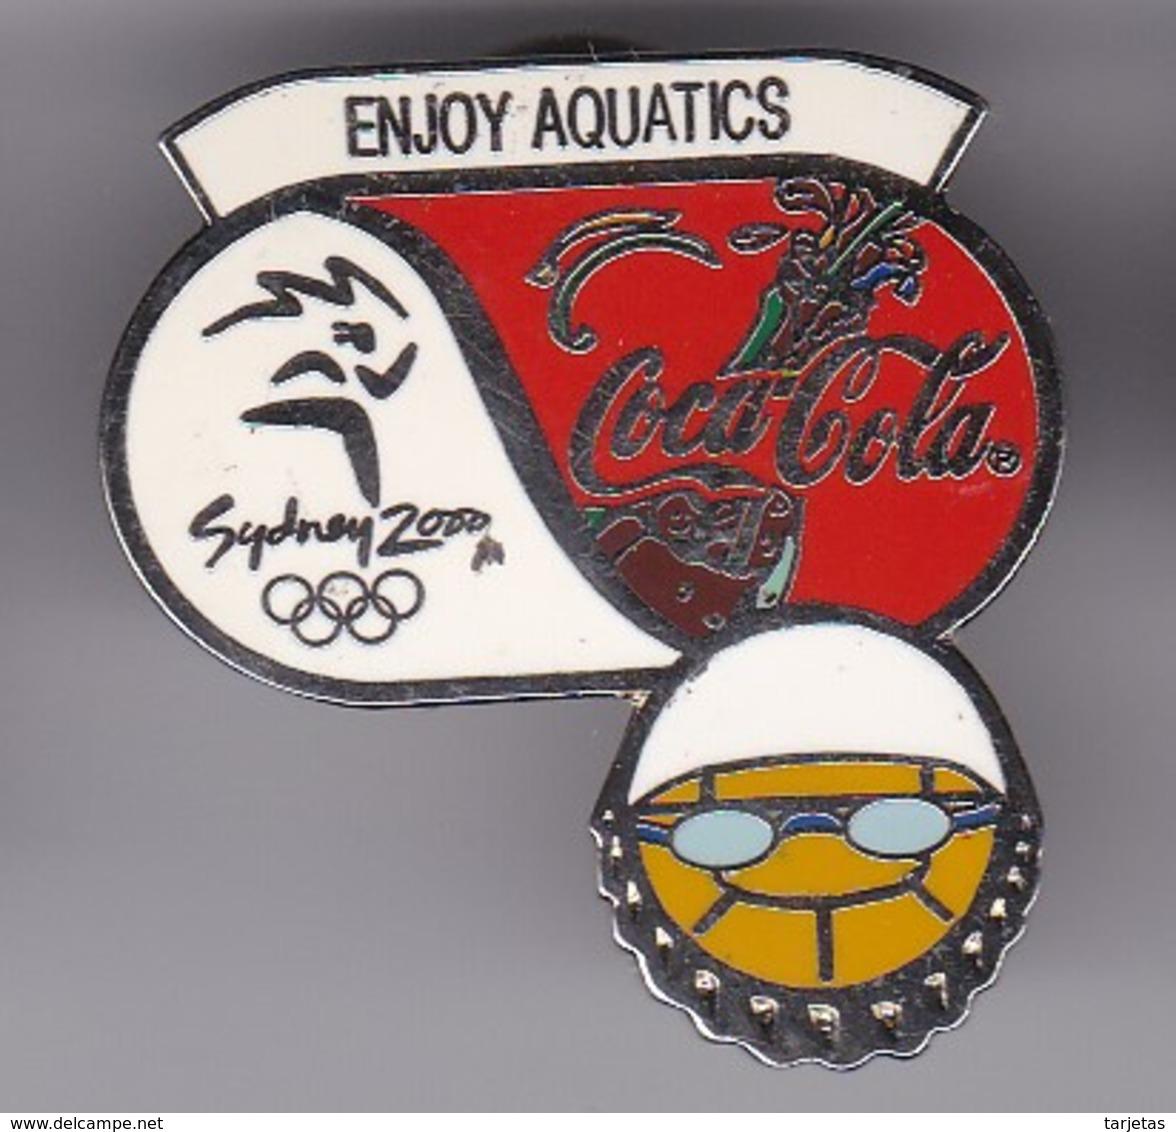 PIN DE COCA-COLA DE LAS OLIMPIADAS DE SYDNEY 2000 - ENJOY AQUATICS - NATACION (COKE) OLYMPIC GAMES - Coca-Cola